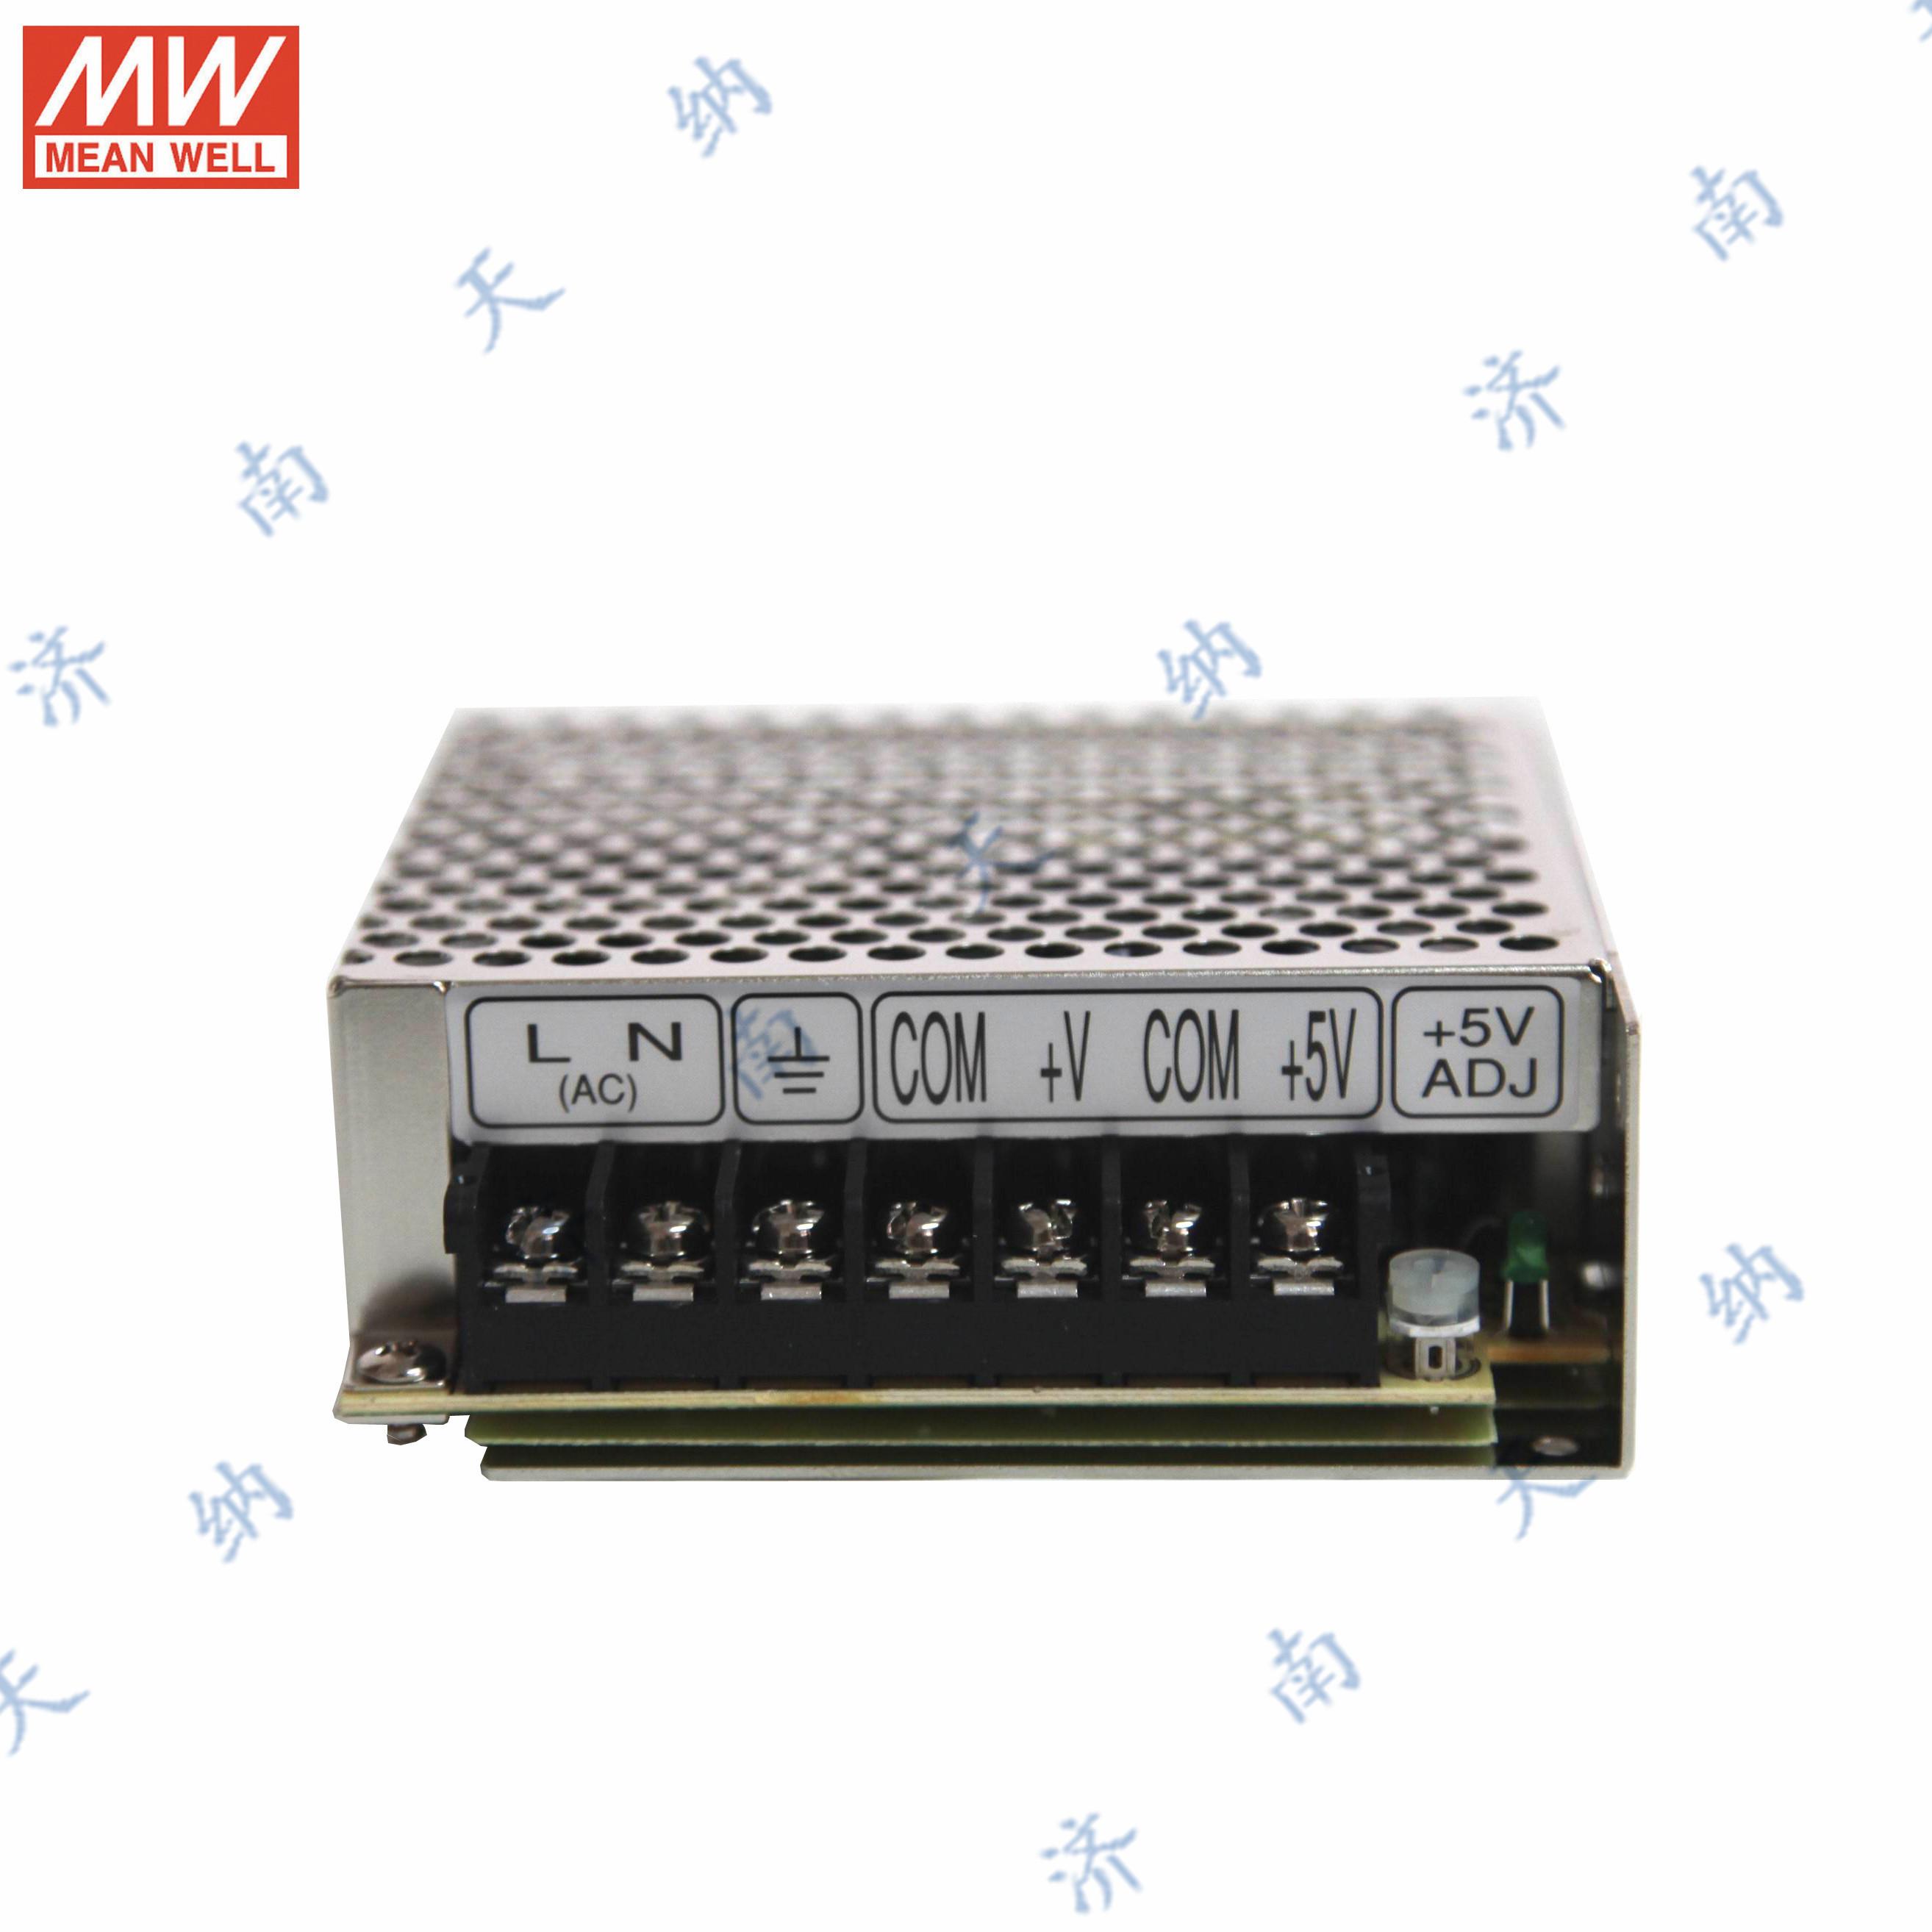 Taiwan meanwell dual switch power supply RD-65B5V24V//65A5V12V